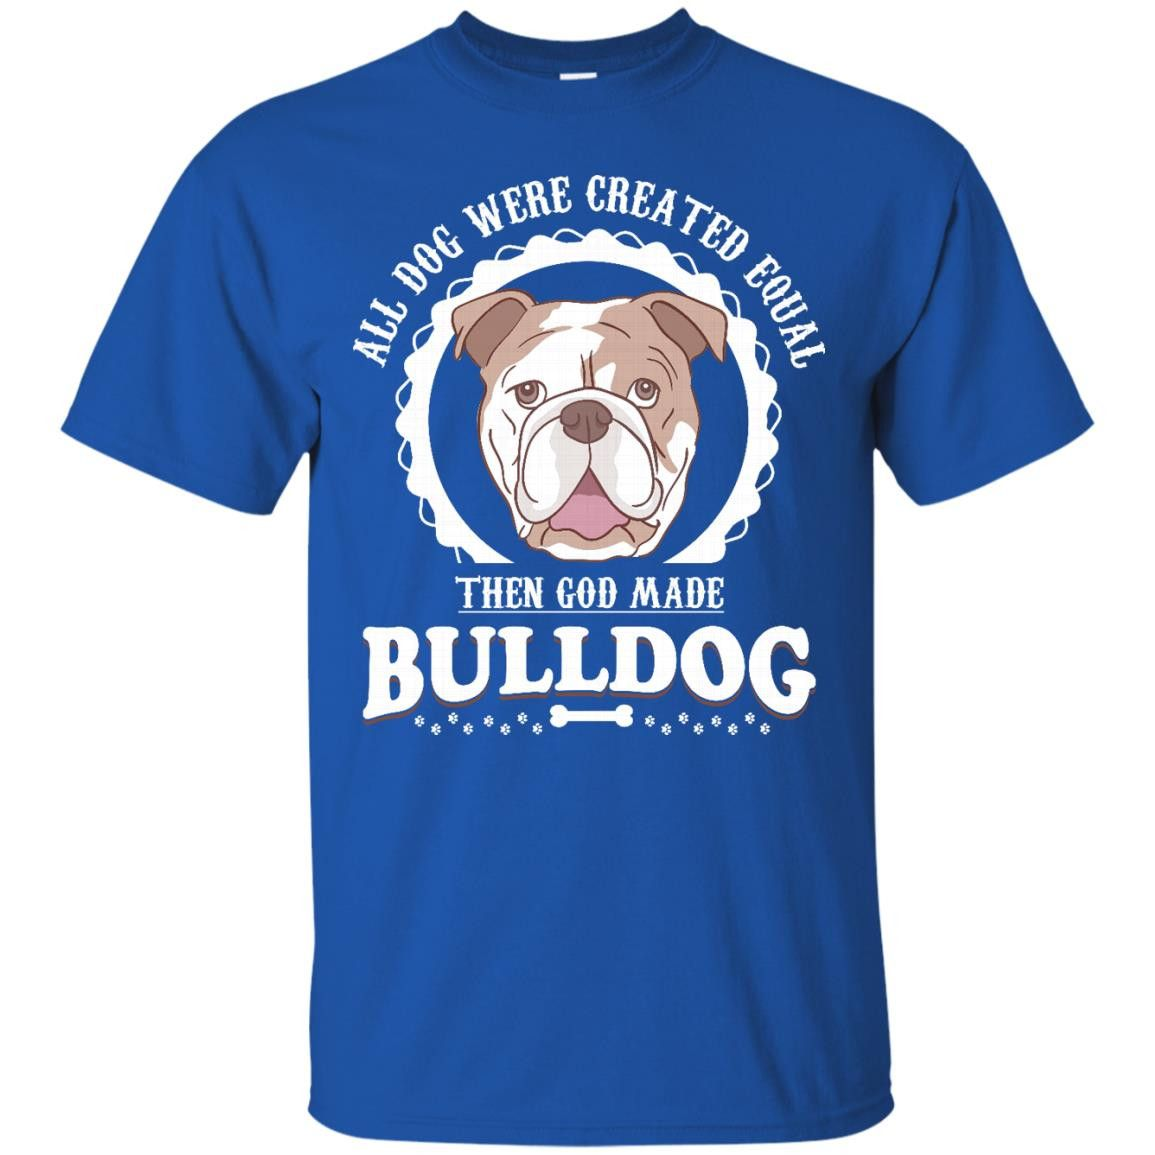 Bulldog Shirts All Dog Equal Then God Made Bulldog T-shirts Hoodies Sweatshirts